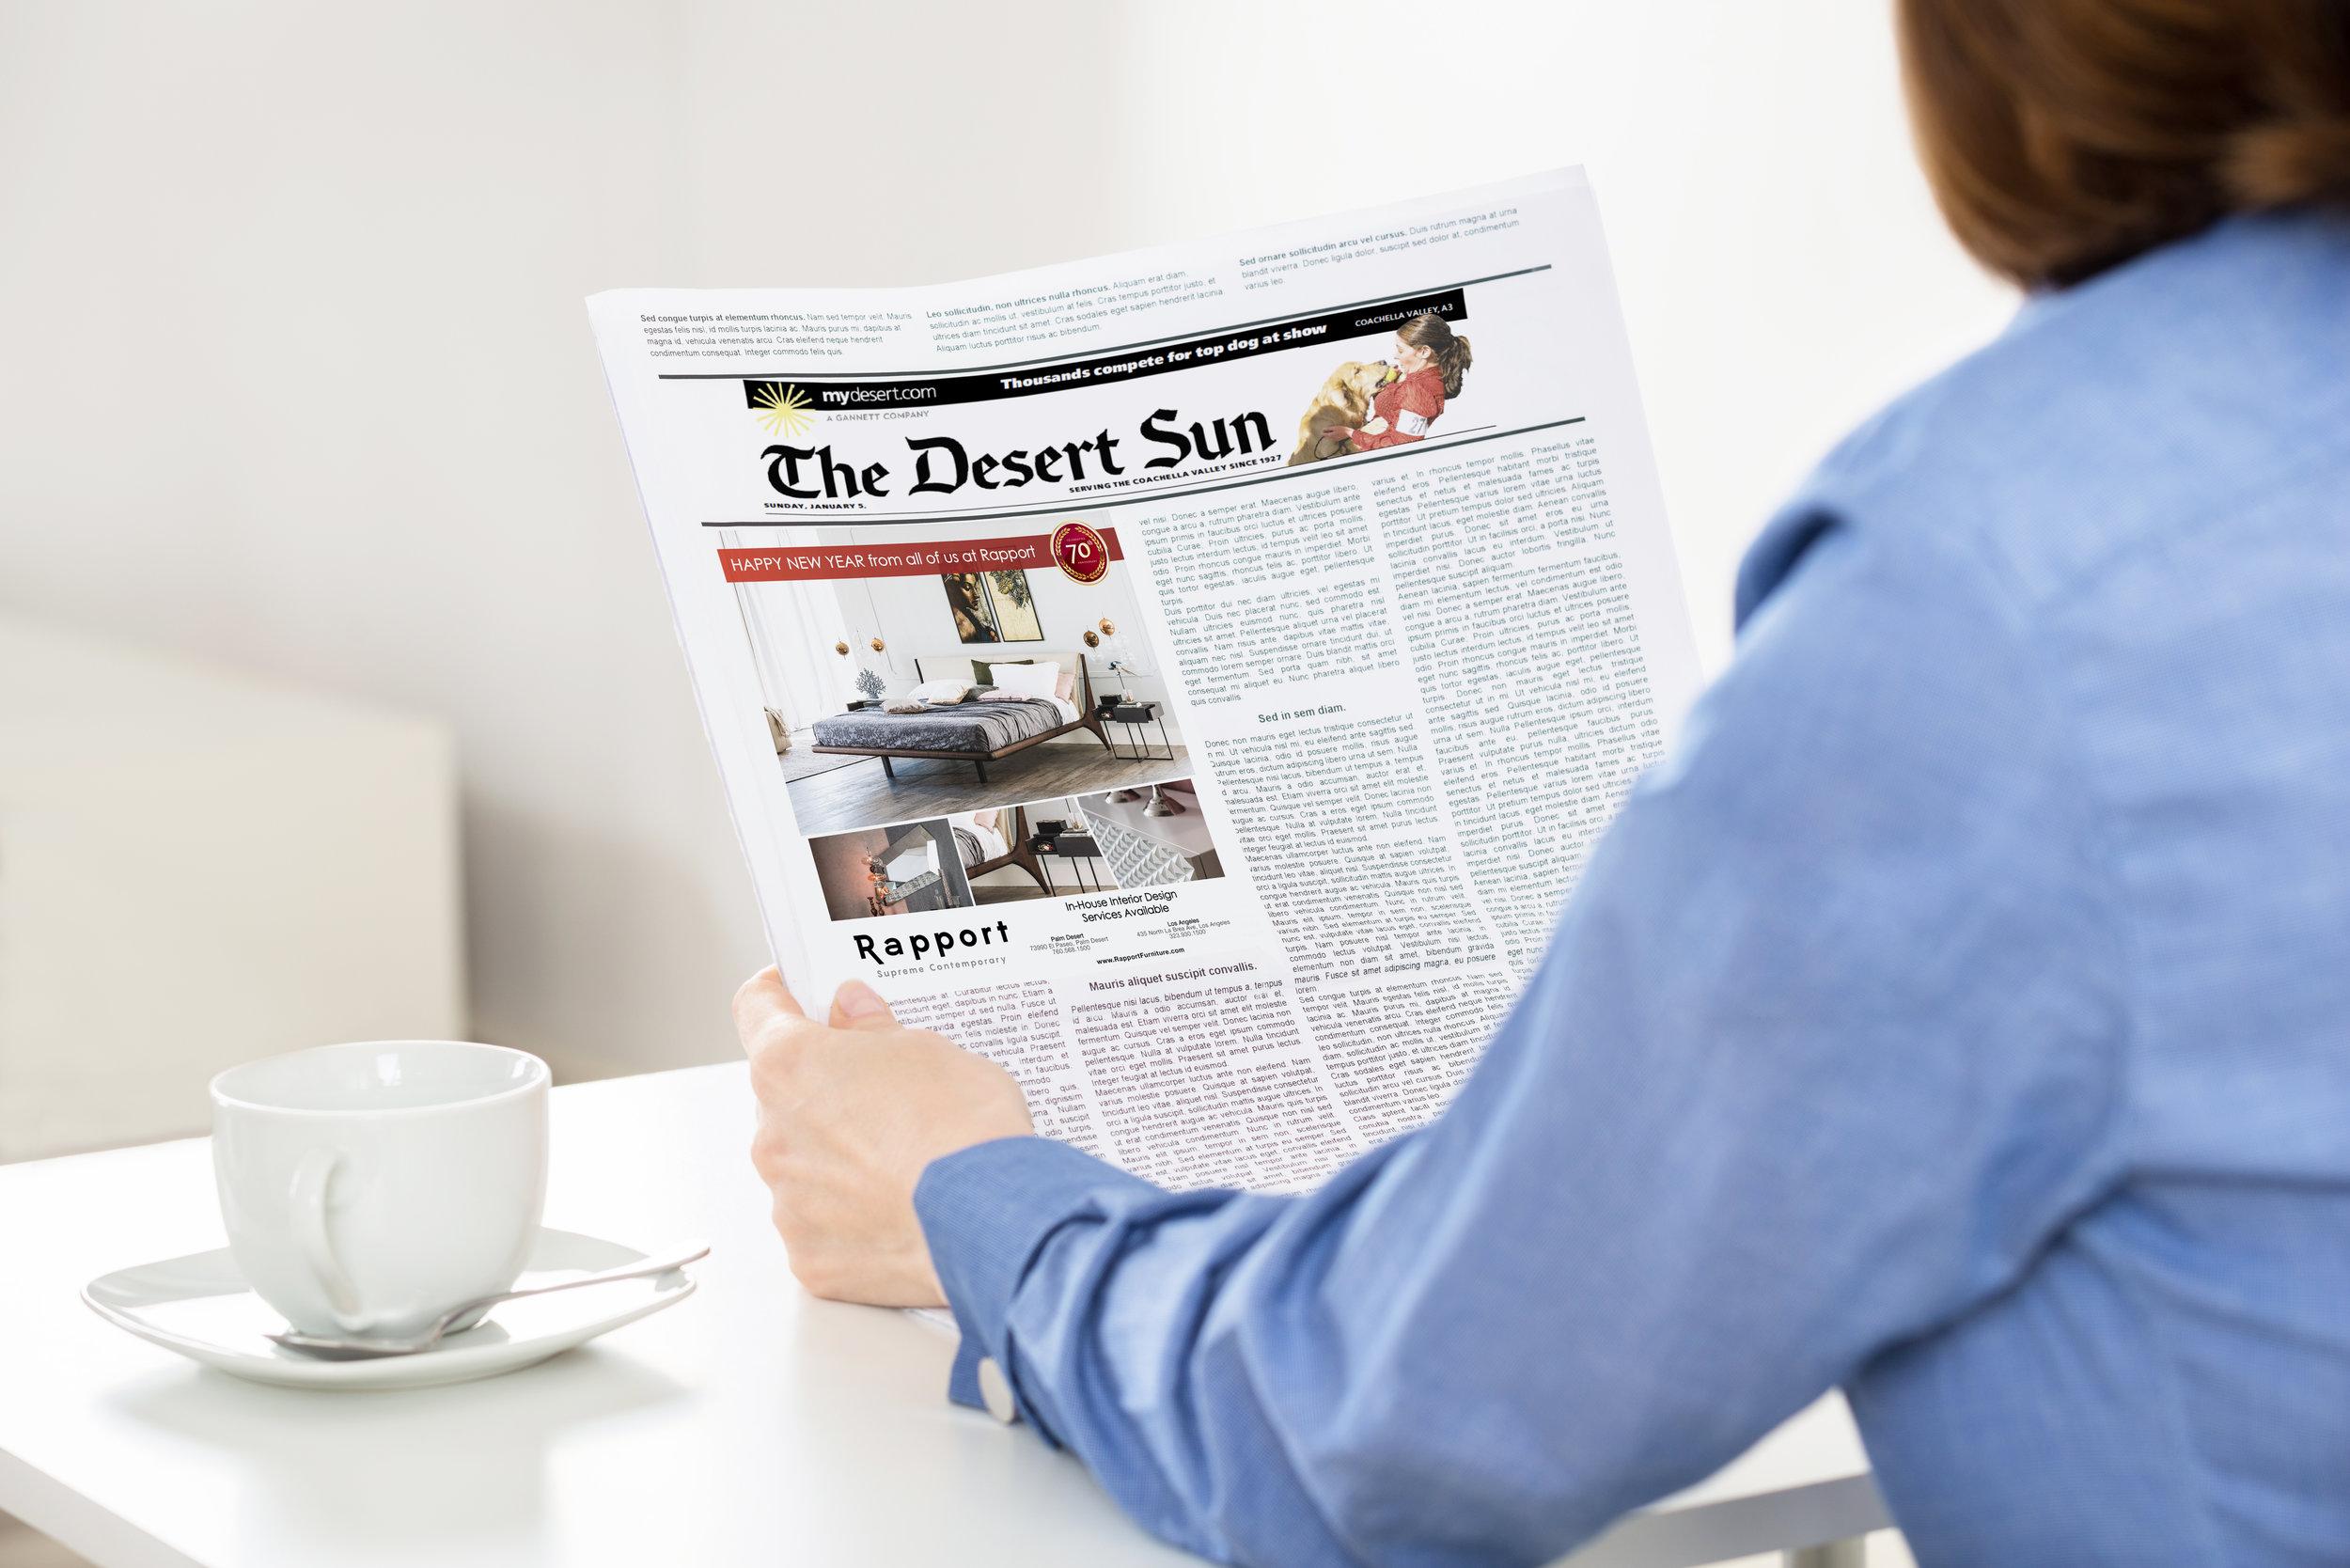 Rapport_DesertSunNewspaper2.jpg